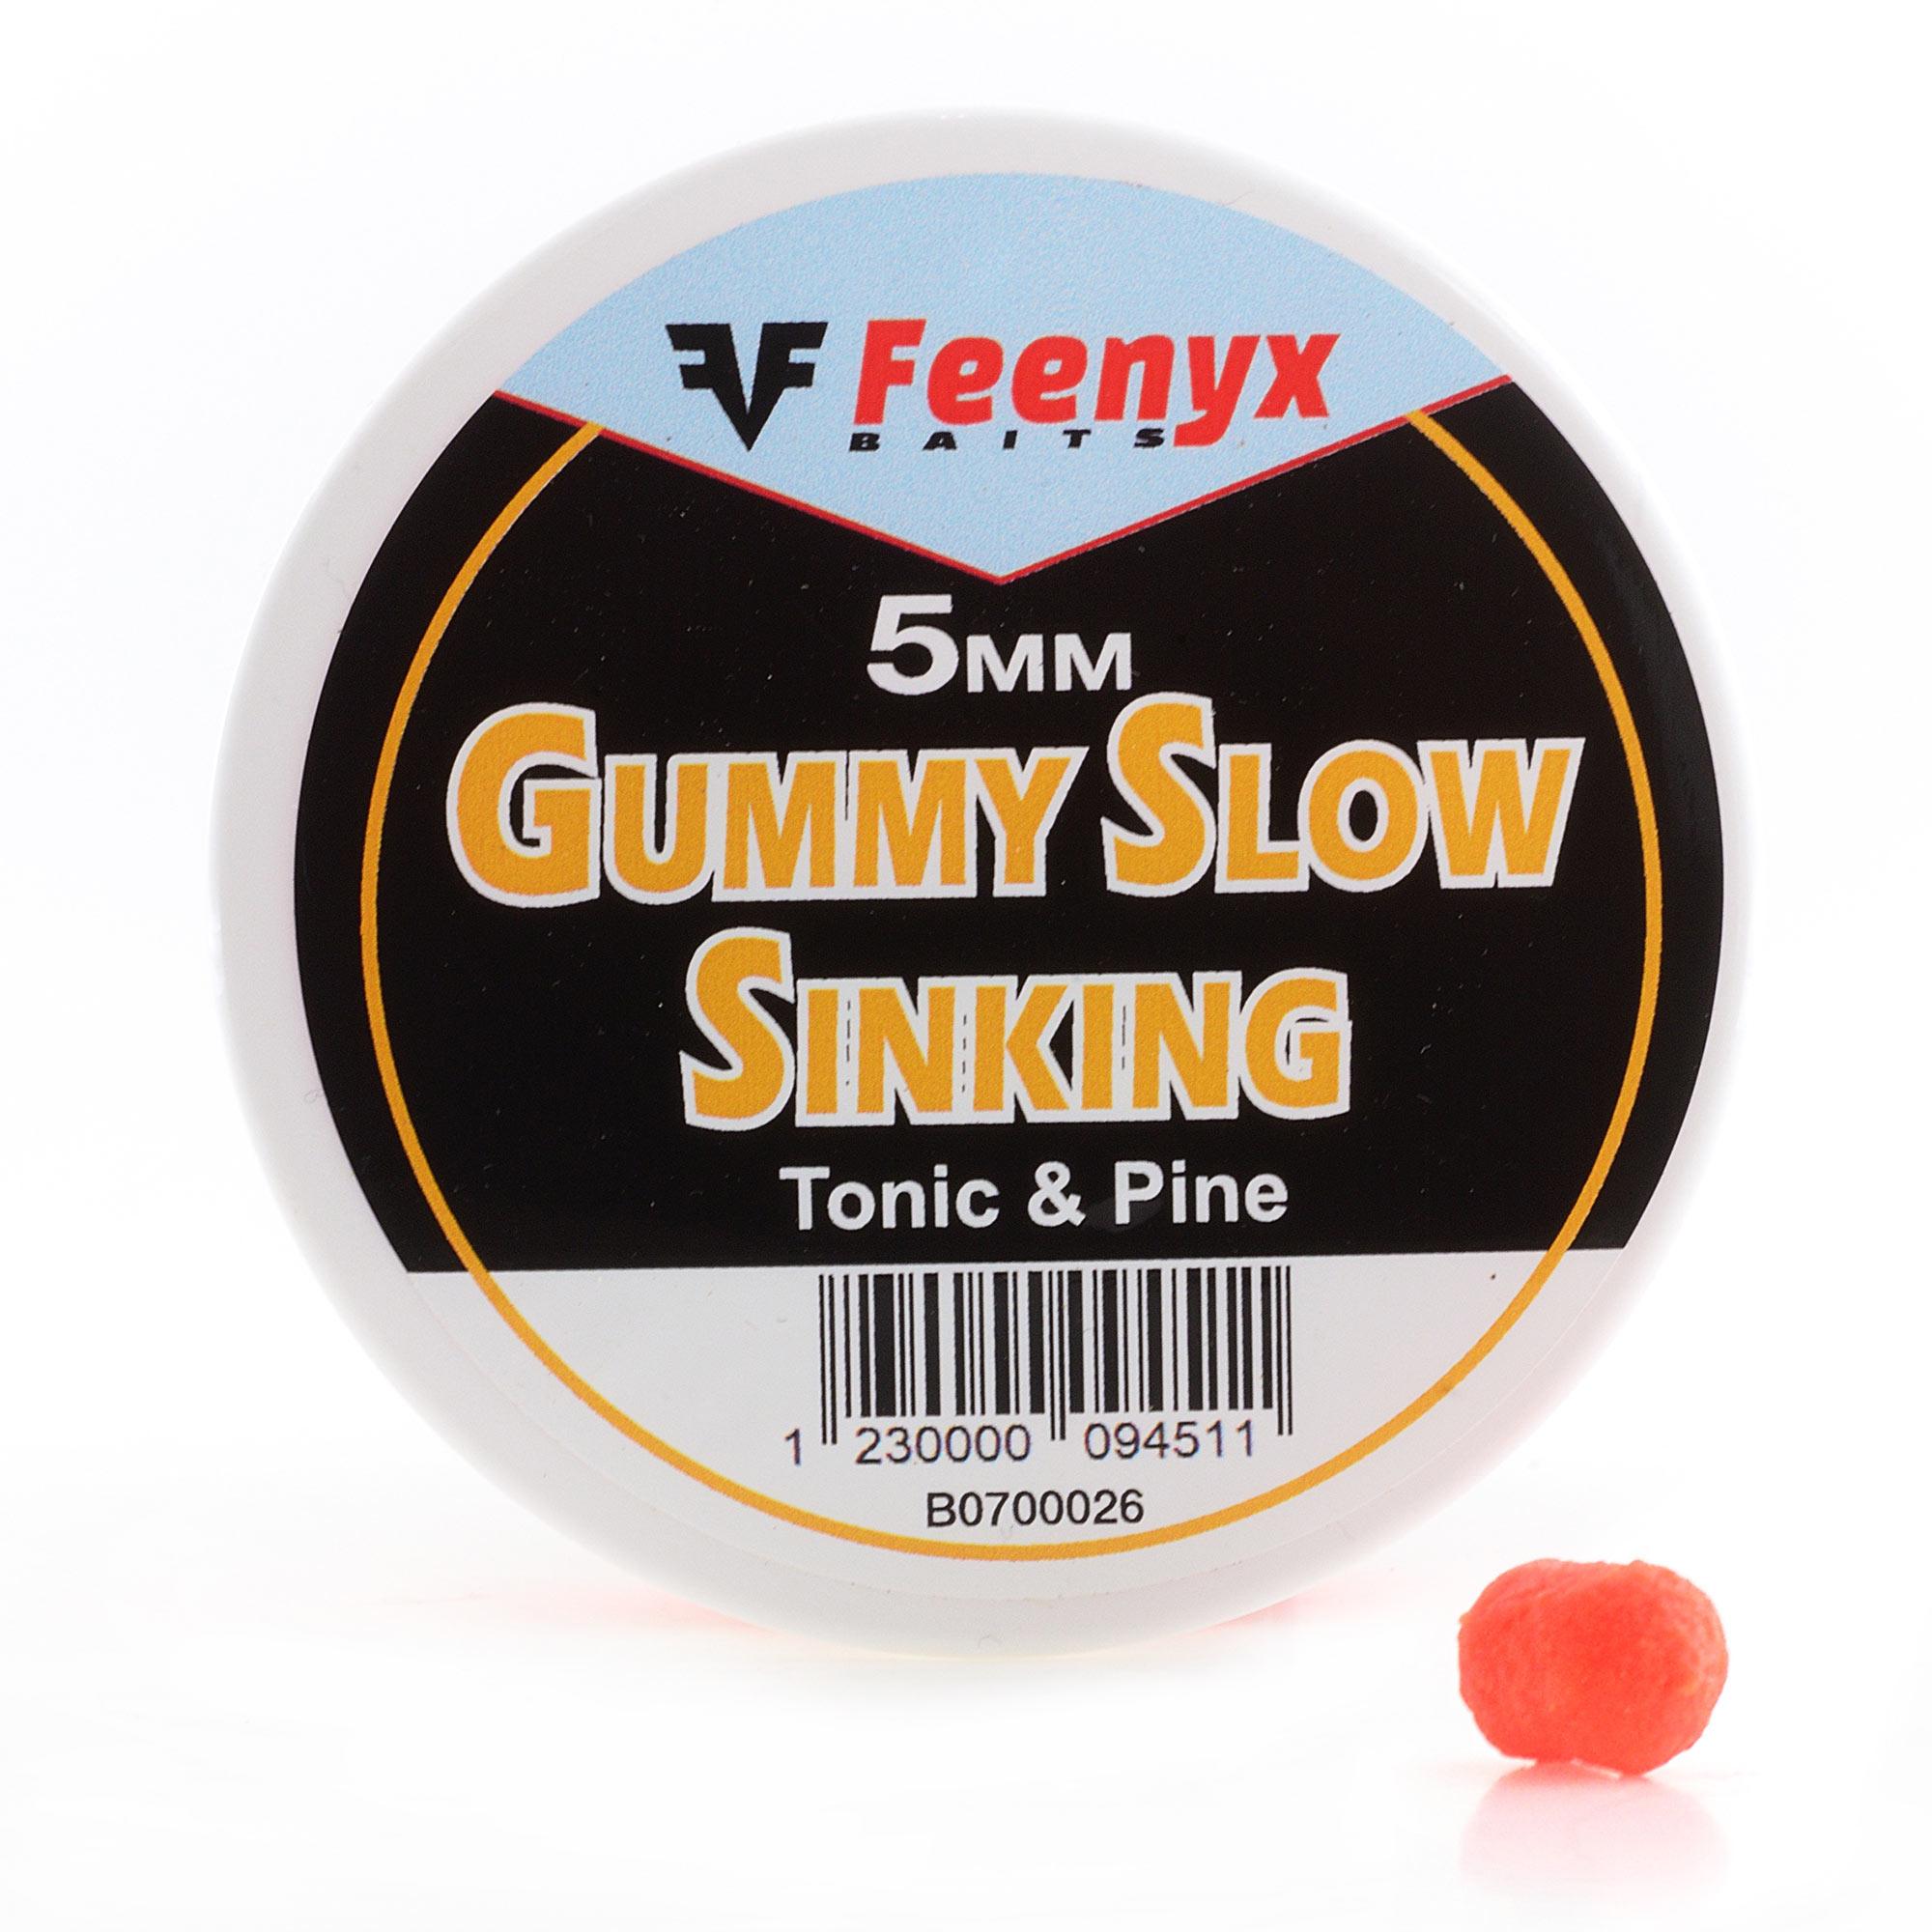 Gummy Slow Sinking Tonic & Pine 5mm FEENYX BAIT